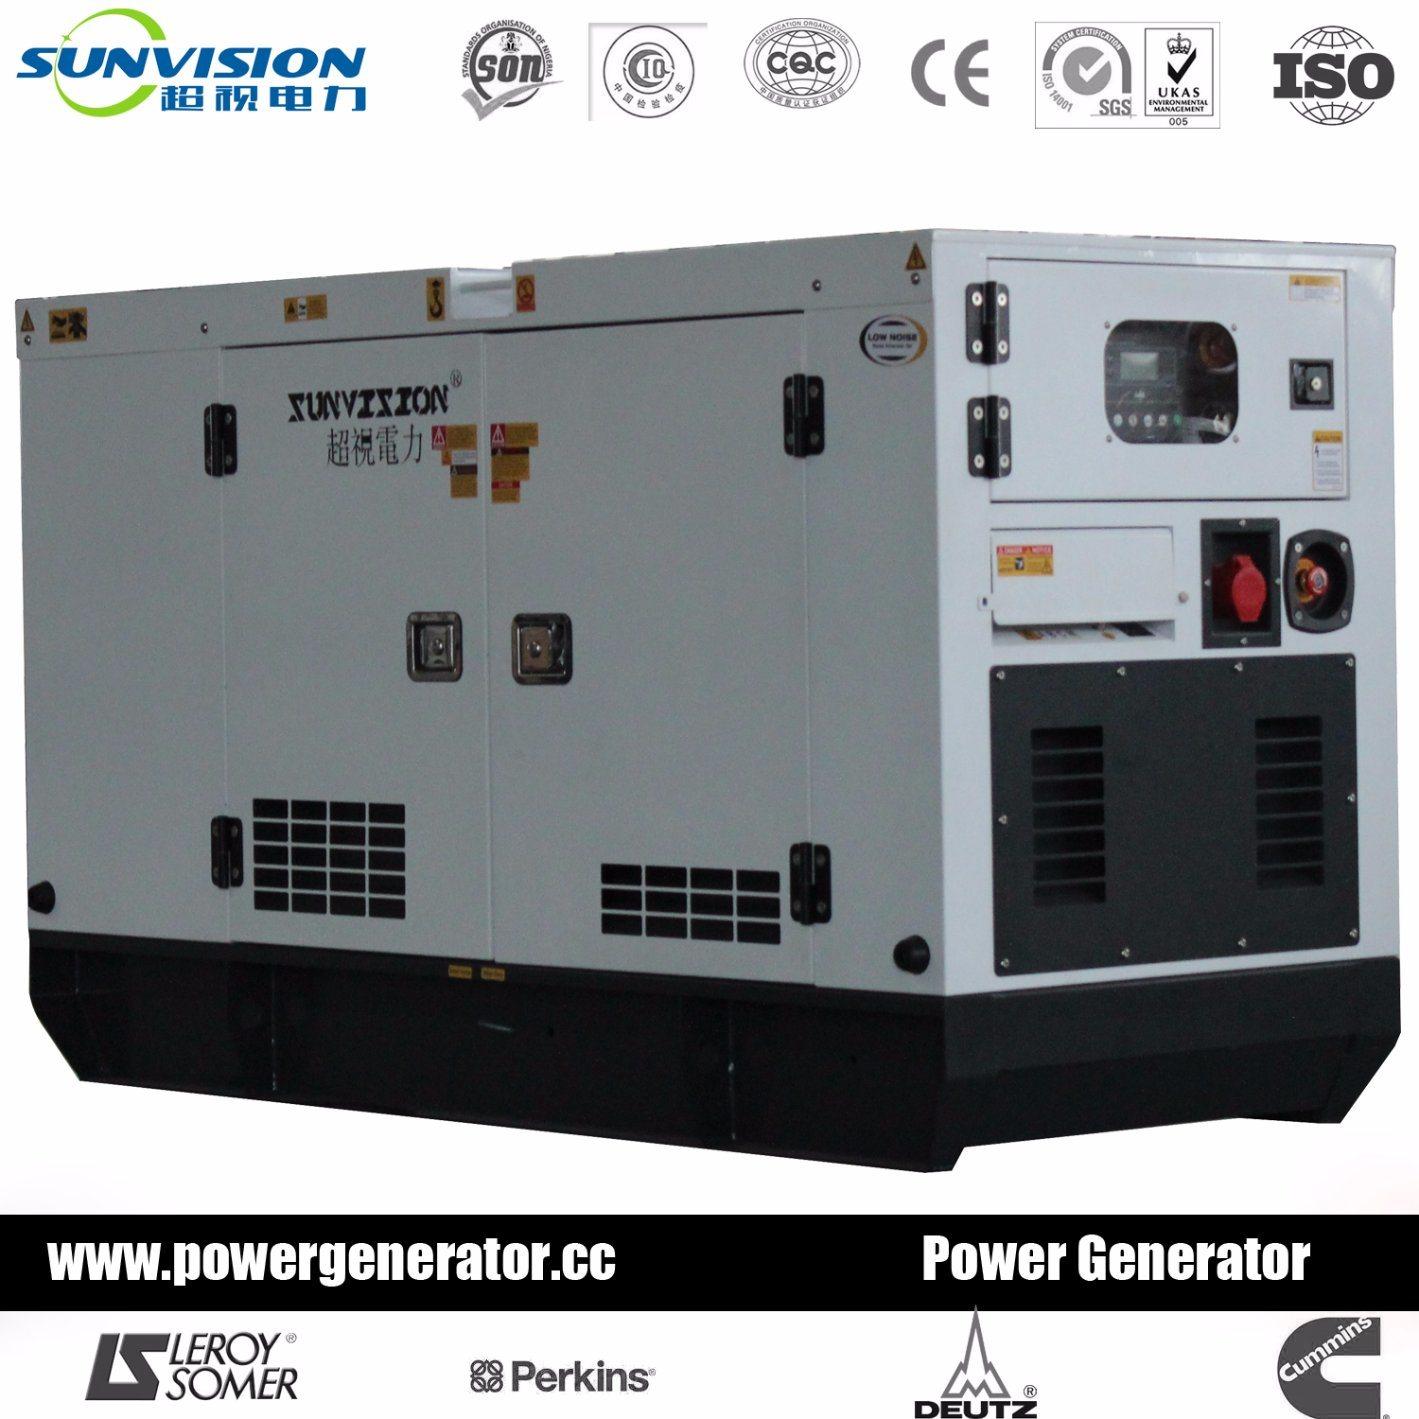 Kubota Generator Sunvision Digital Technology Co Limited page 1